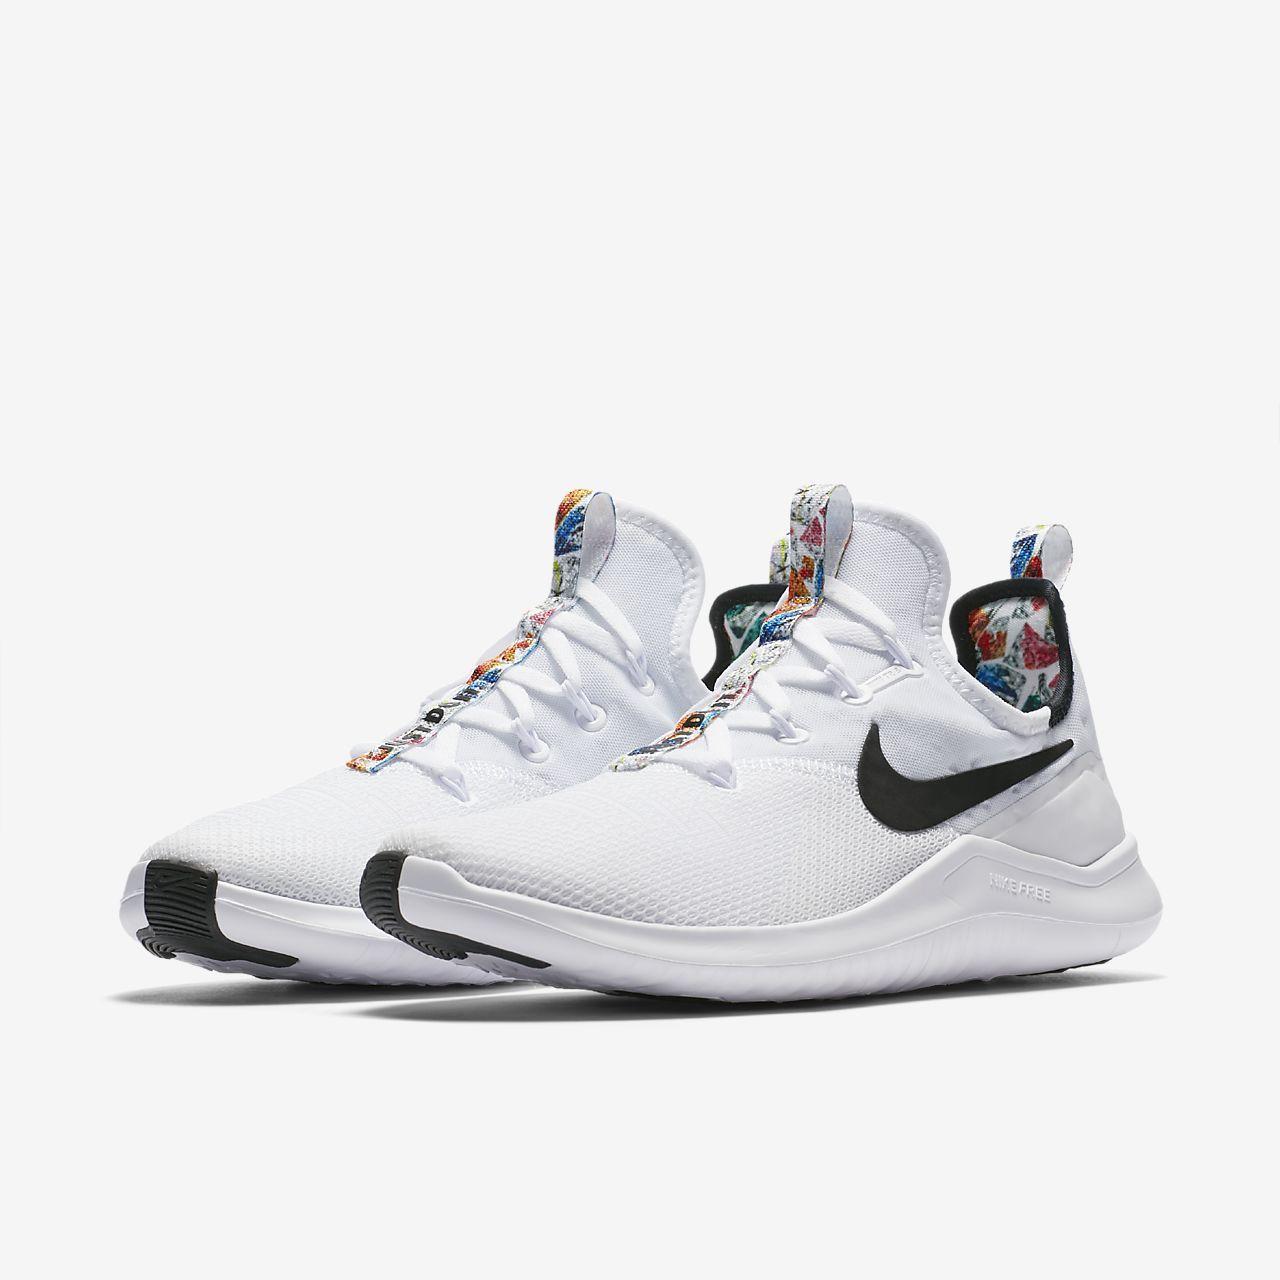 reputable site 05fe5 11b21 Γυναικείο παπούτσι προπόνησης Nike Free TR 8 Print